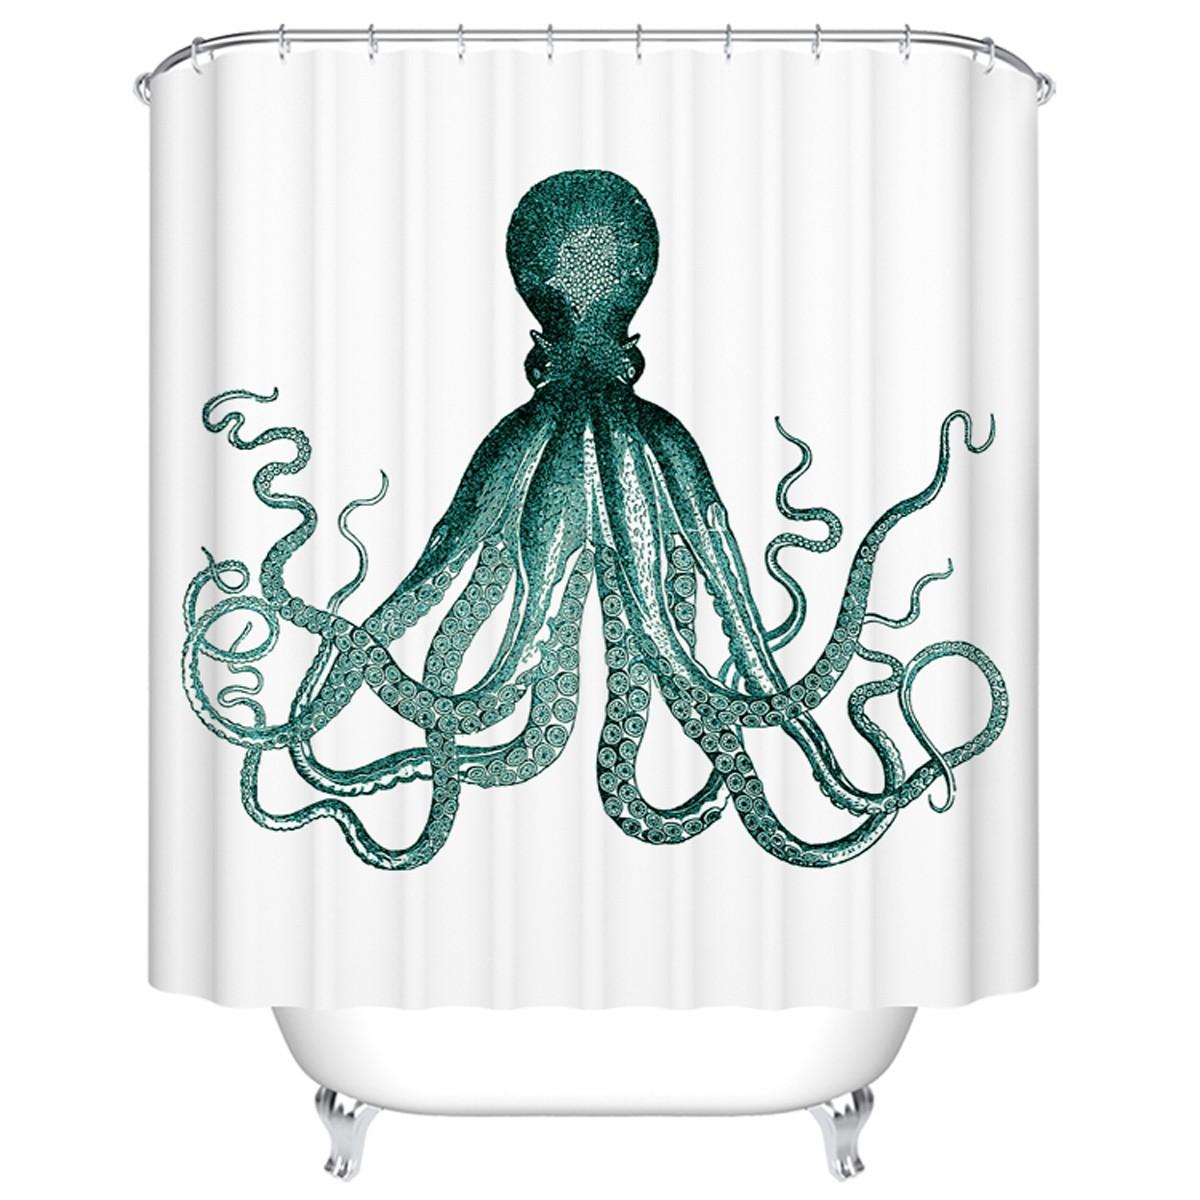 "Bathroom Waterproof Shower Curtain, 70"" W x 72"" H (DK-YT015)"